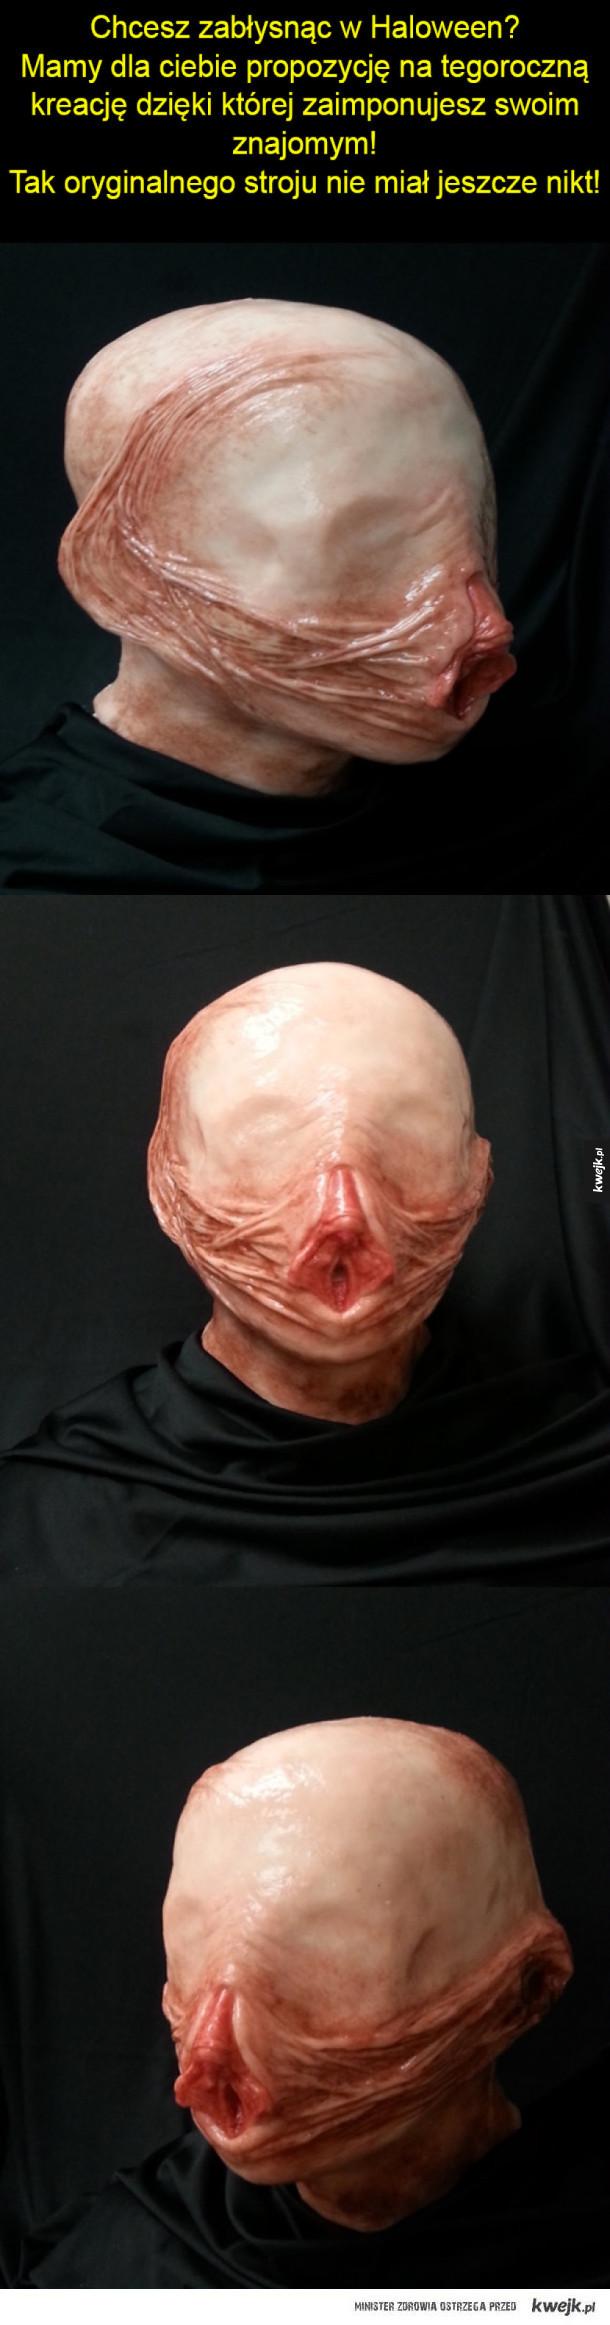 Najlepsza maska na Halloween!